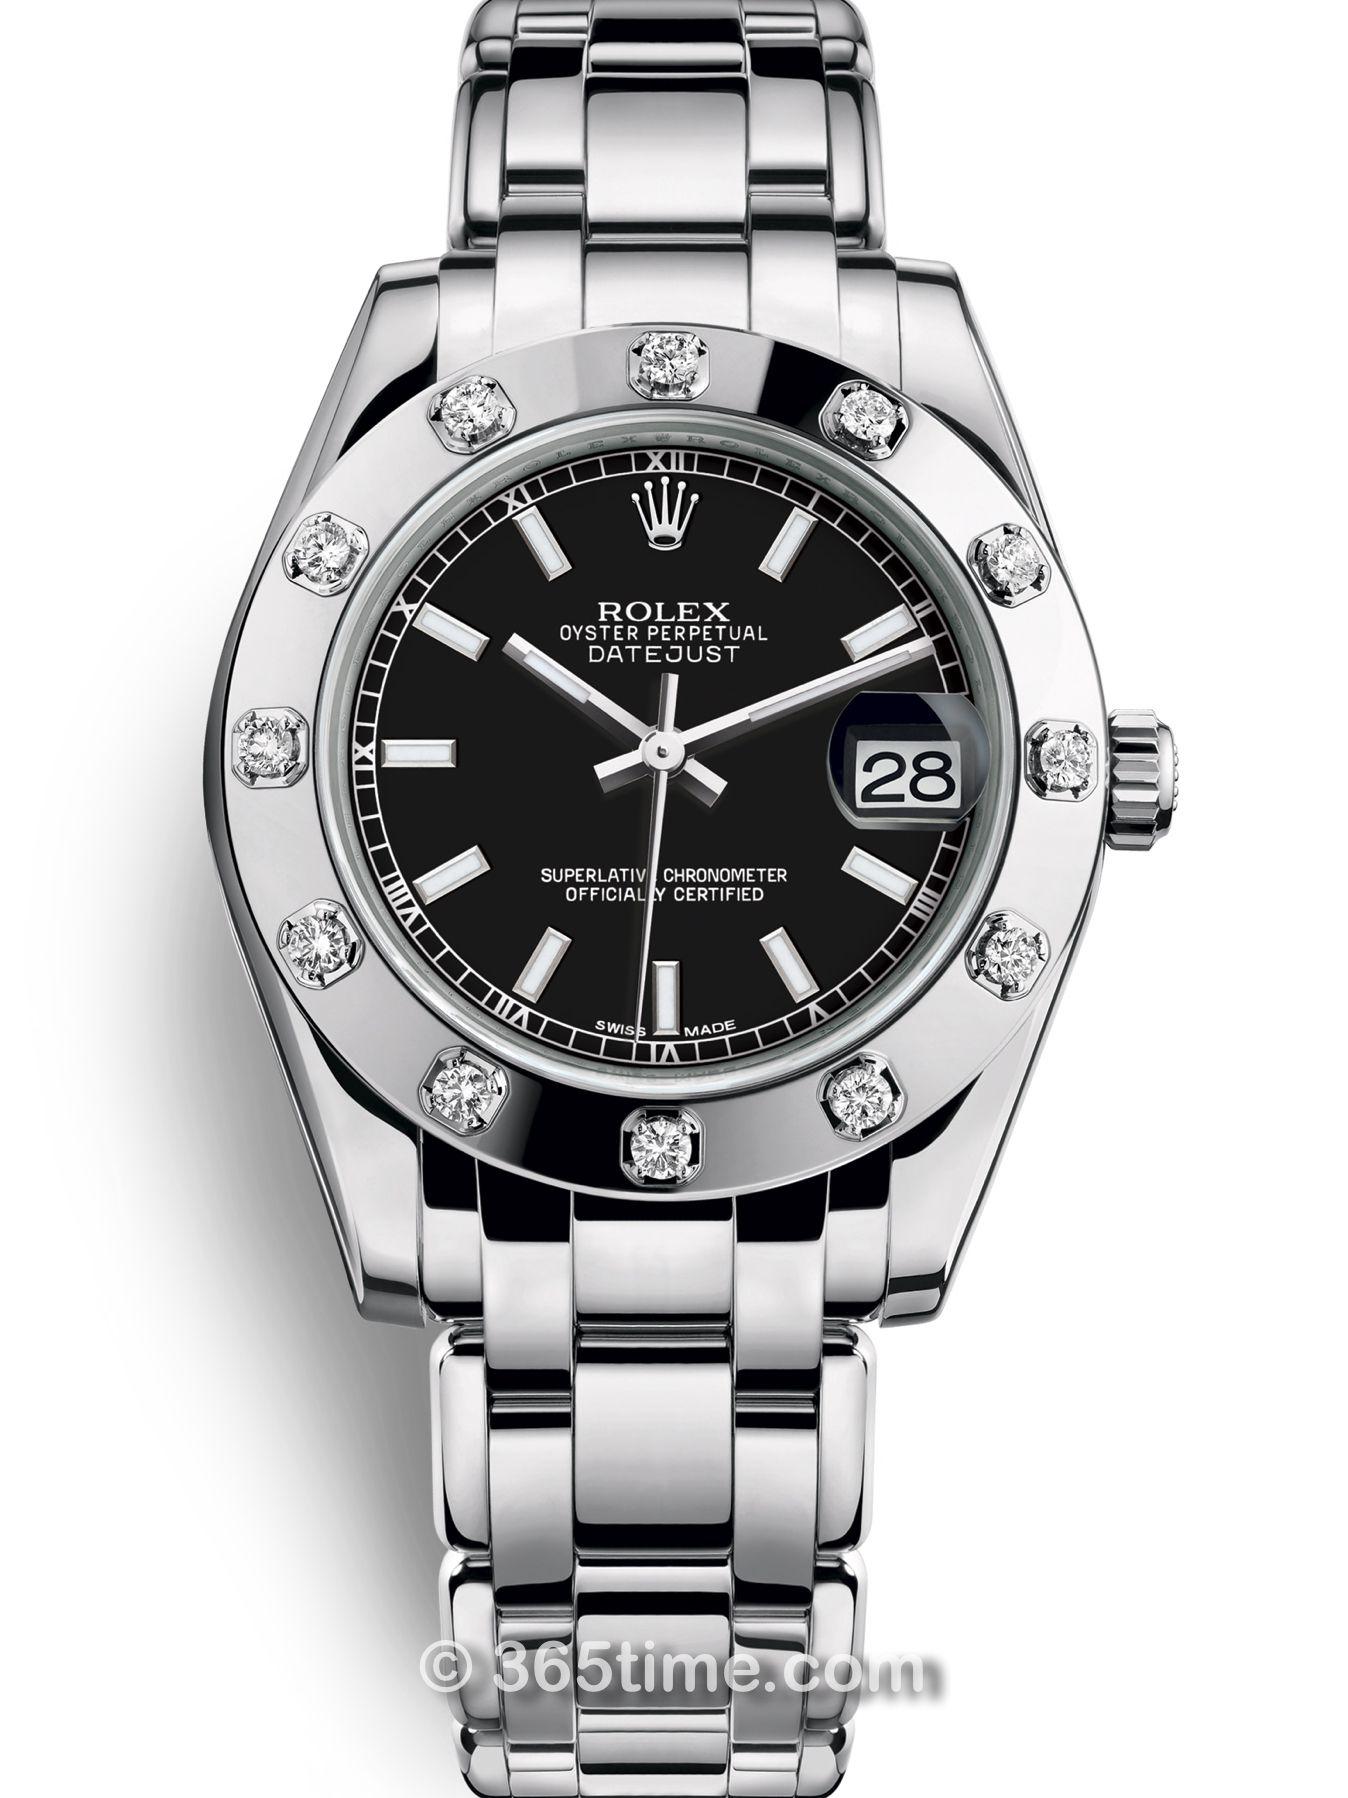 Rolex劳力士蚝式女装系列日志珍珠淑女型34陨石表盘腕表81319-0027